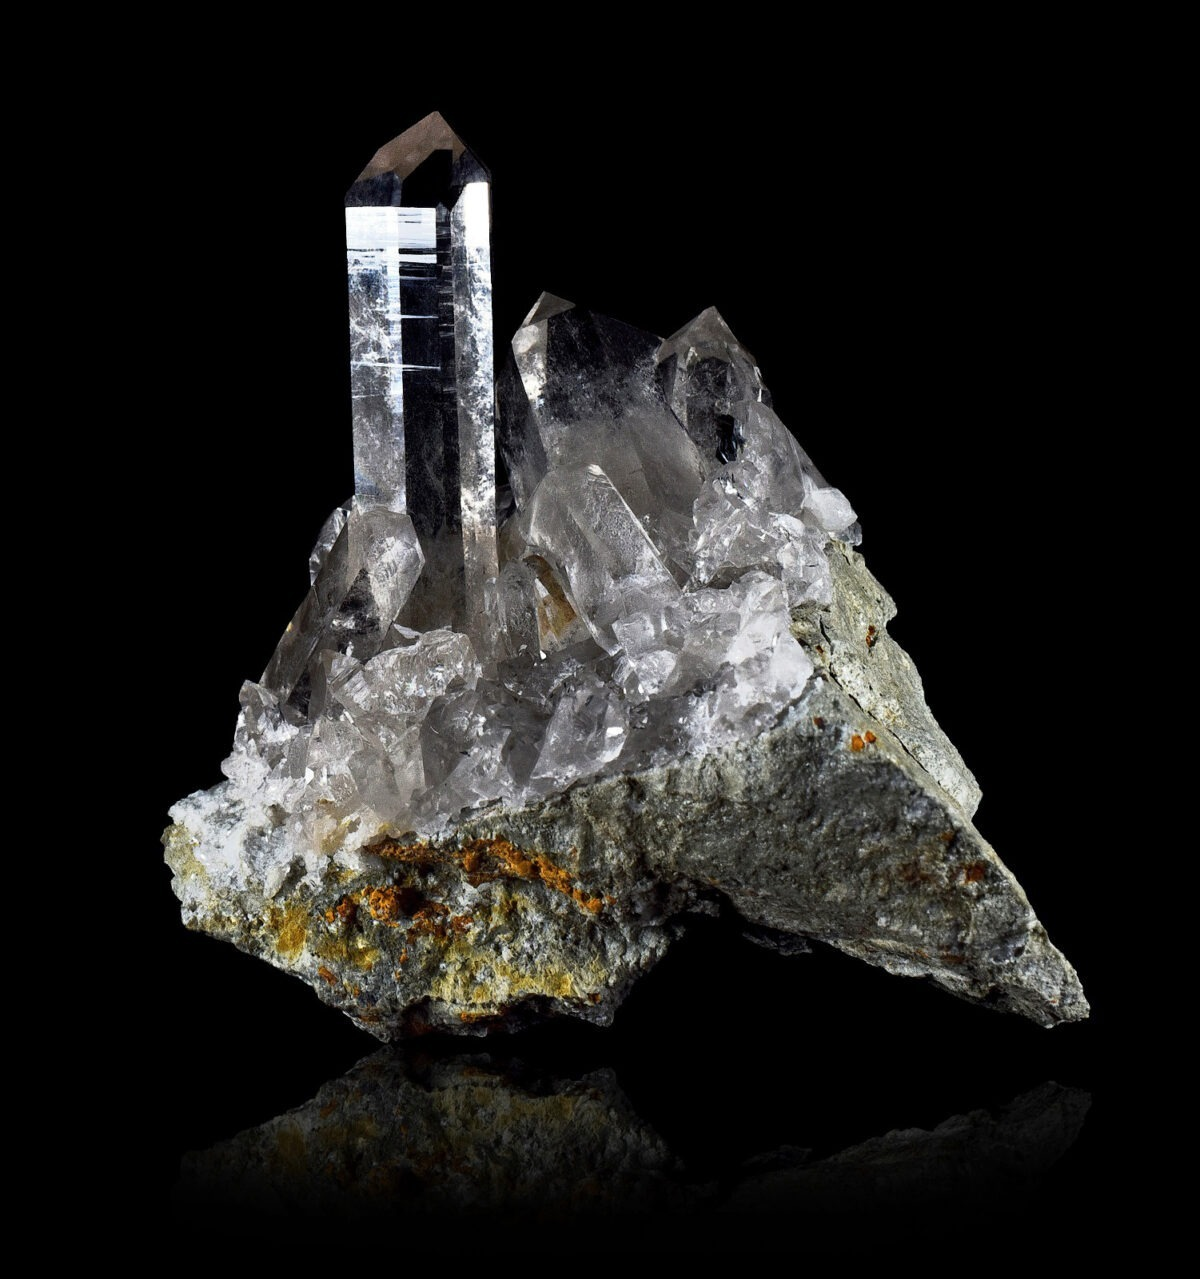 Quartz crystal from Les Deux Alpes, France